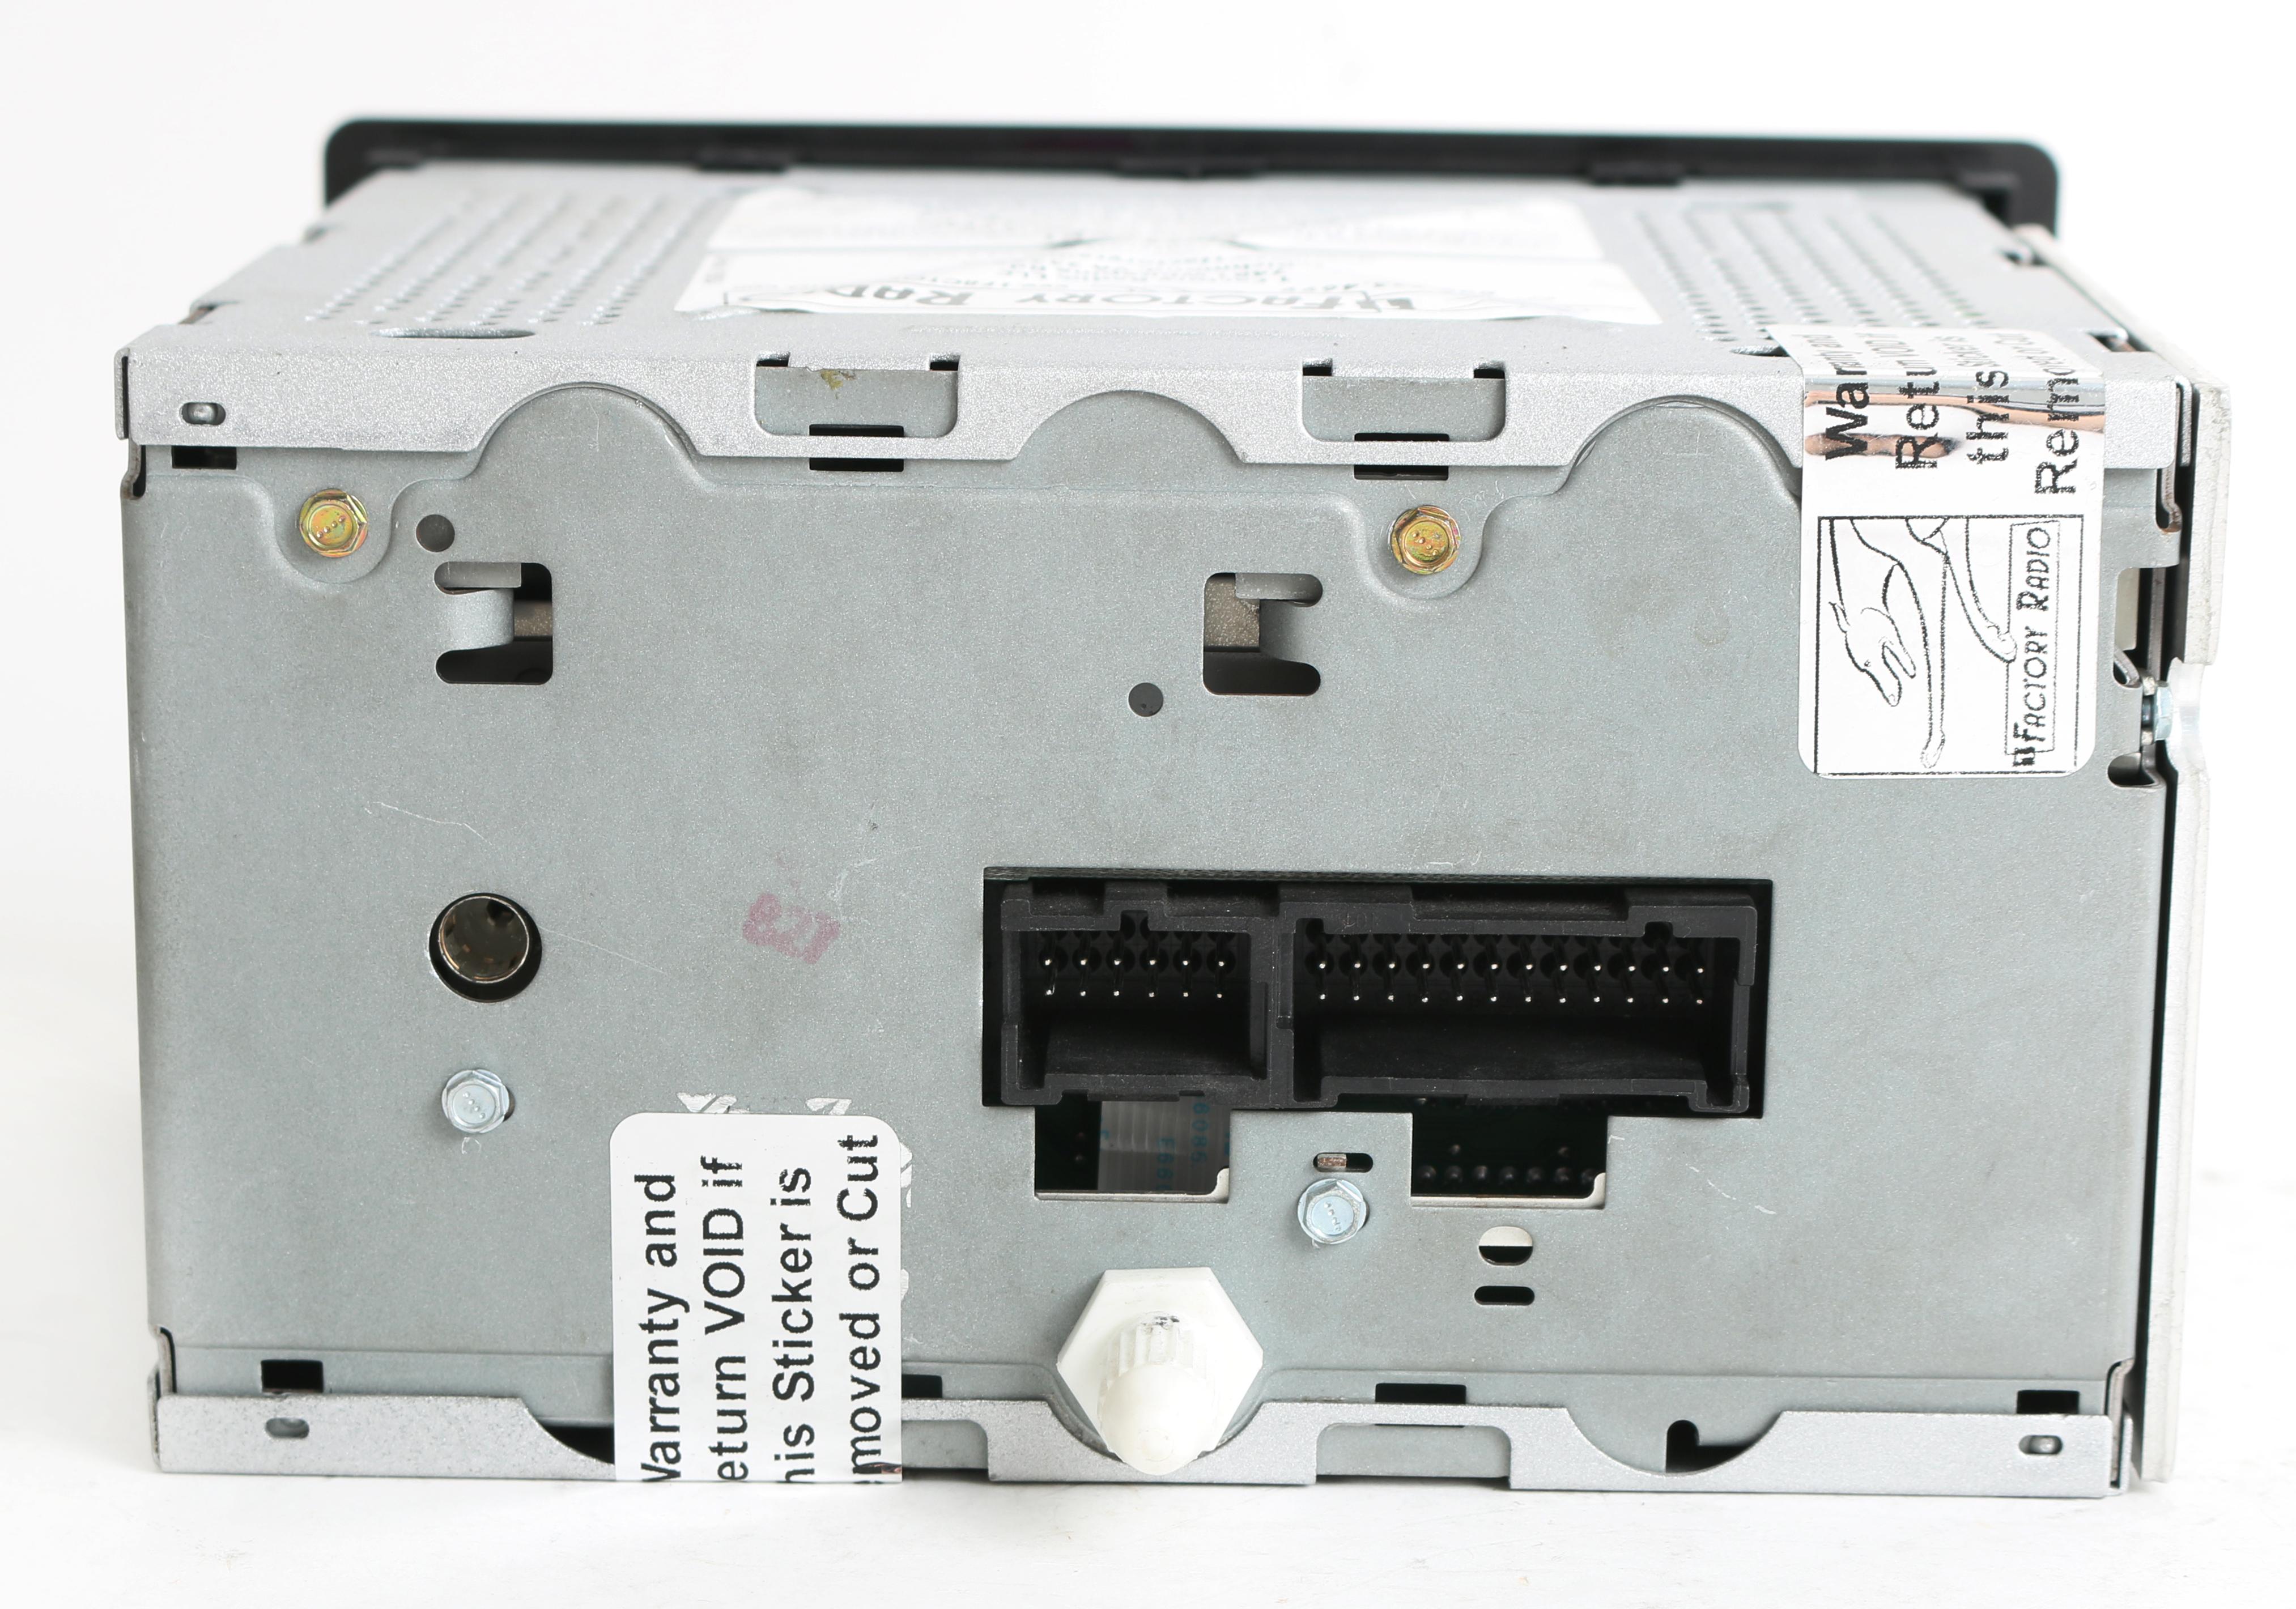 Gm Delco Radio Wiring Diagram Model 15184933 Trusted Schematics 1985 Harness Chevy Gmc 2003 2005 Truck Am Fm Cd Cassette W Auxiliary Mp3